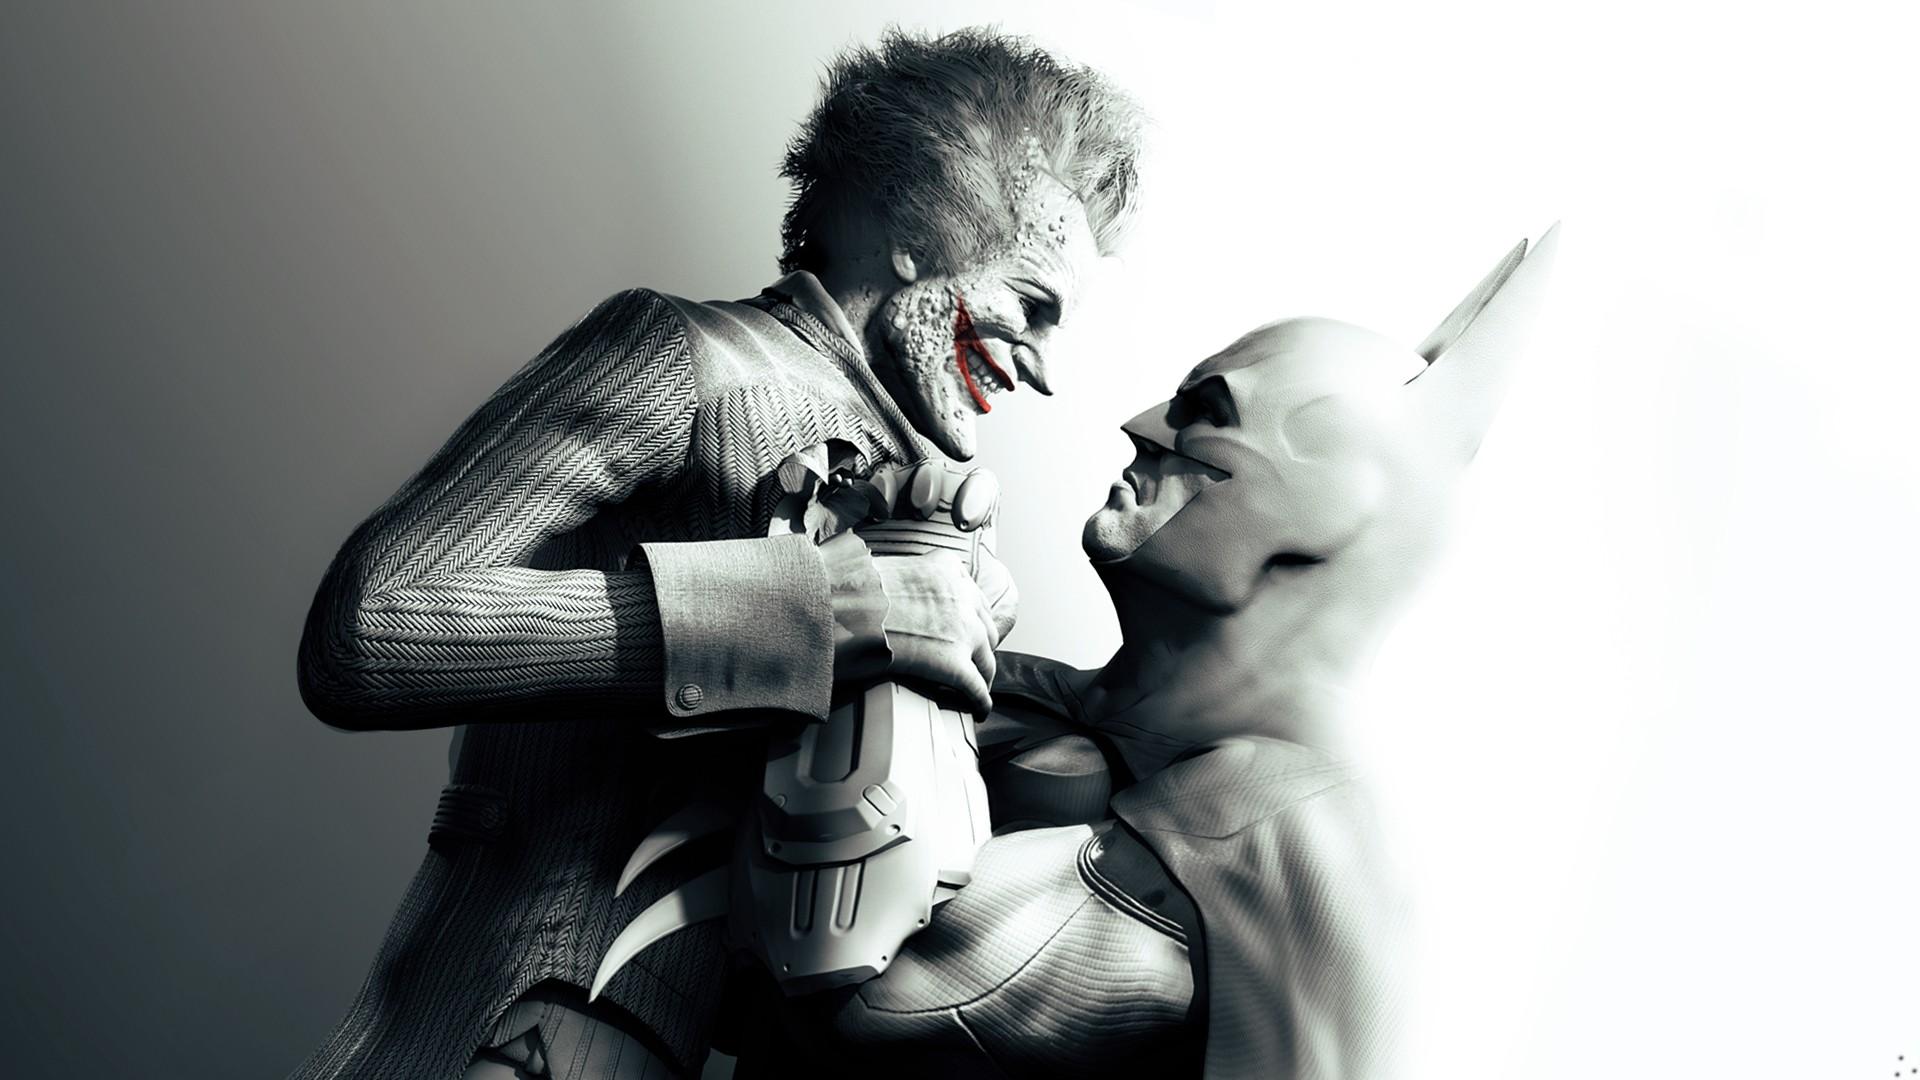 Joker vs Batman wallpaper | 1920x1080 | #28478